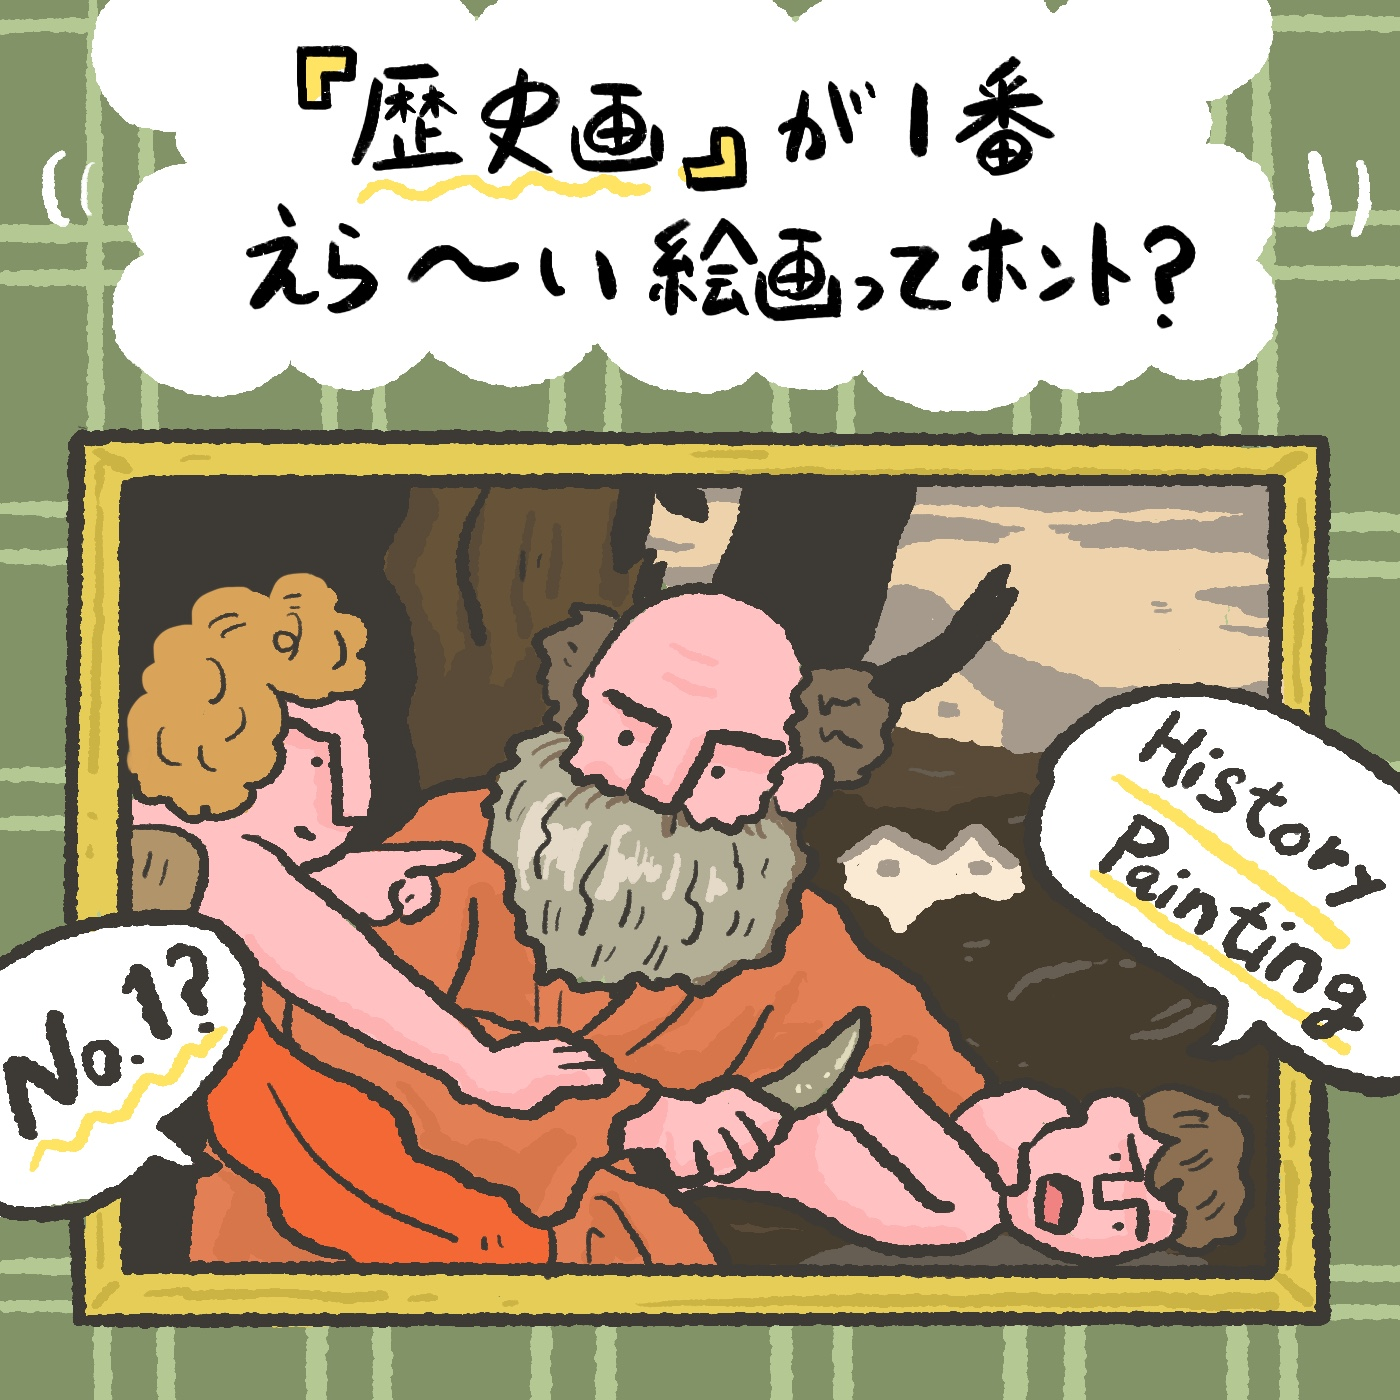 OBIKAKE ナニソレ 歴史画 藤野遼太